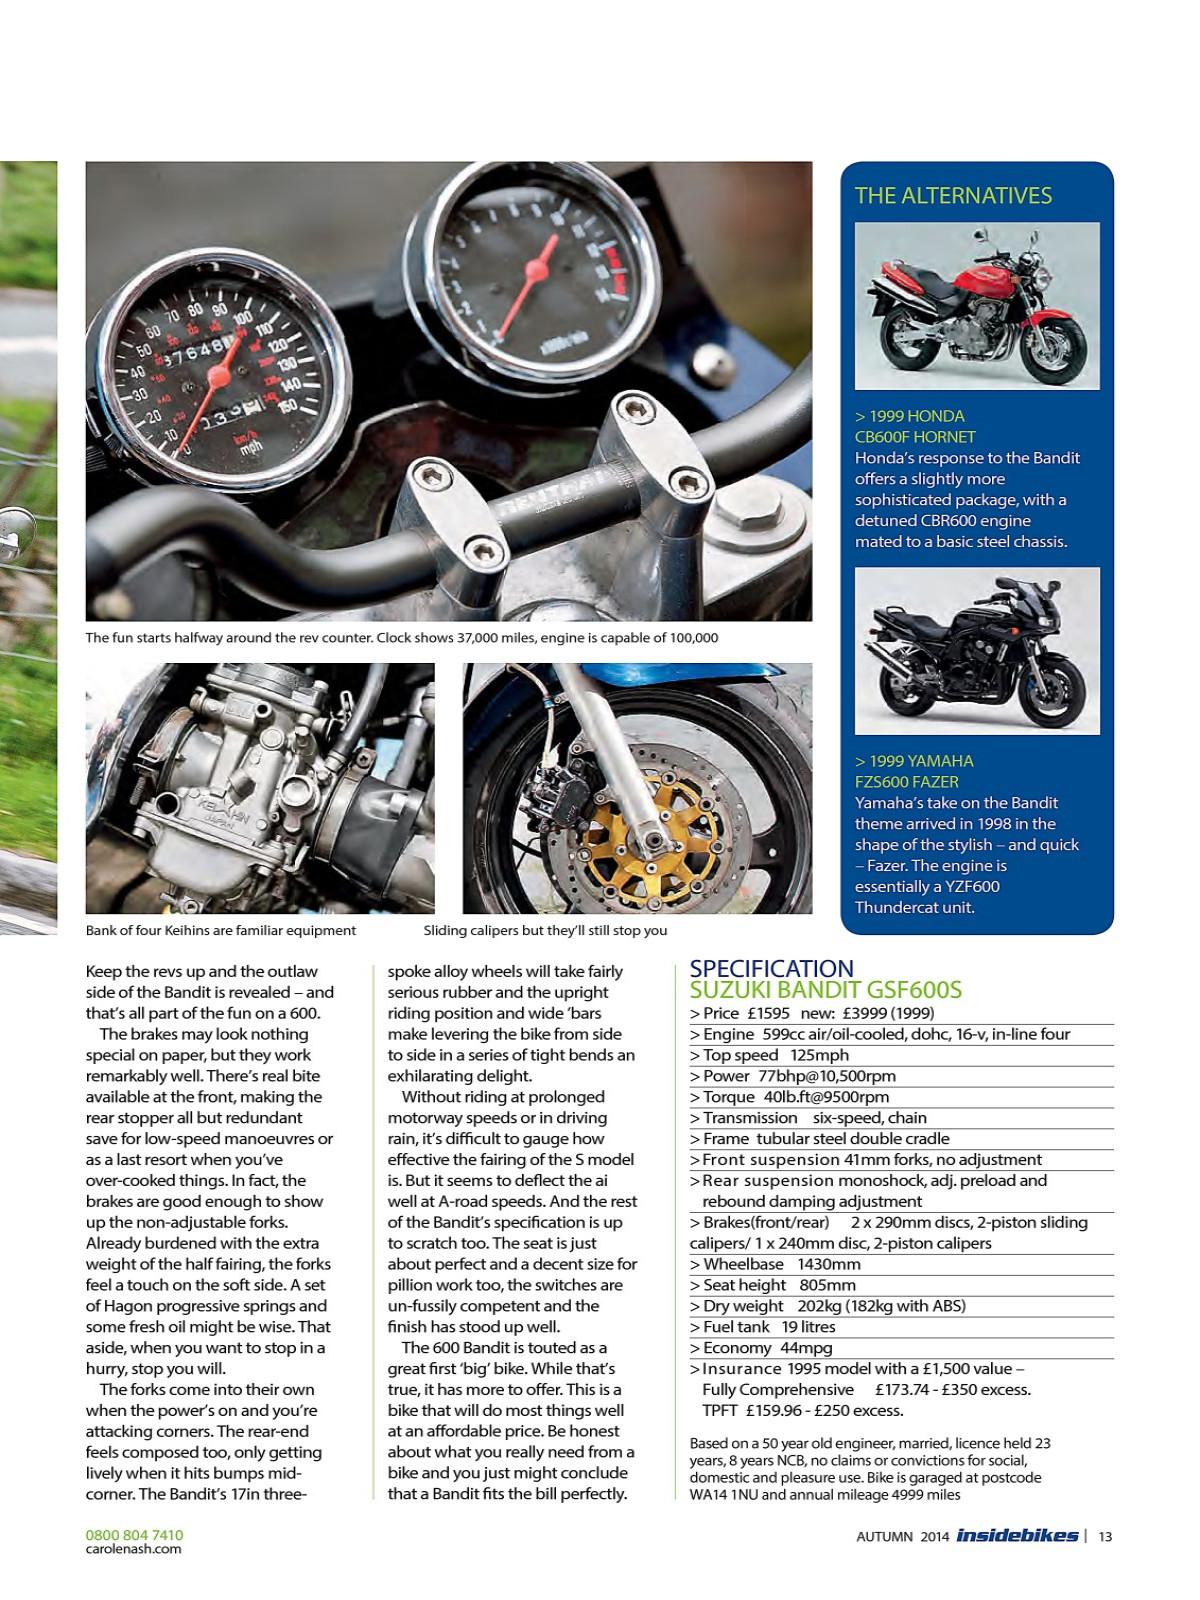 MYEBOOK - Inside Bikes Autumn 2014